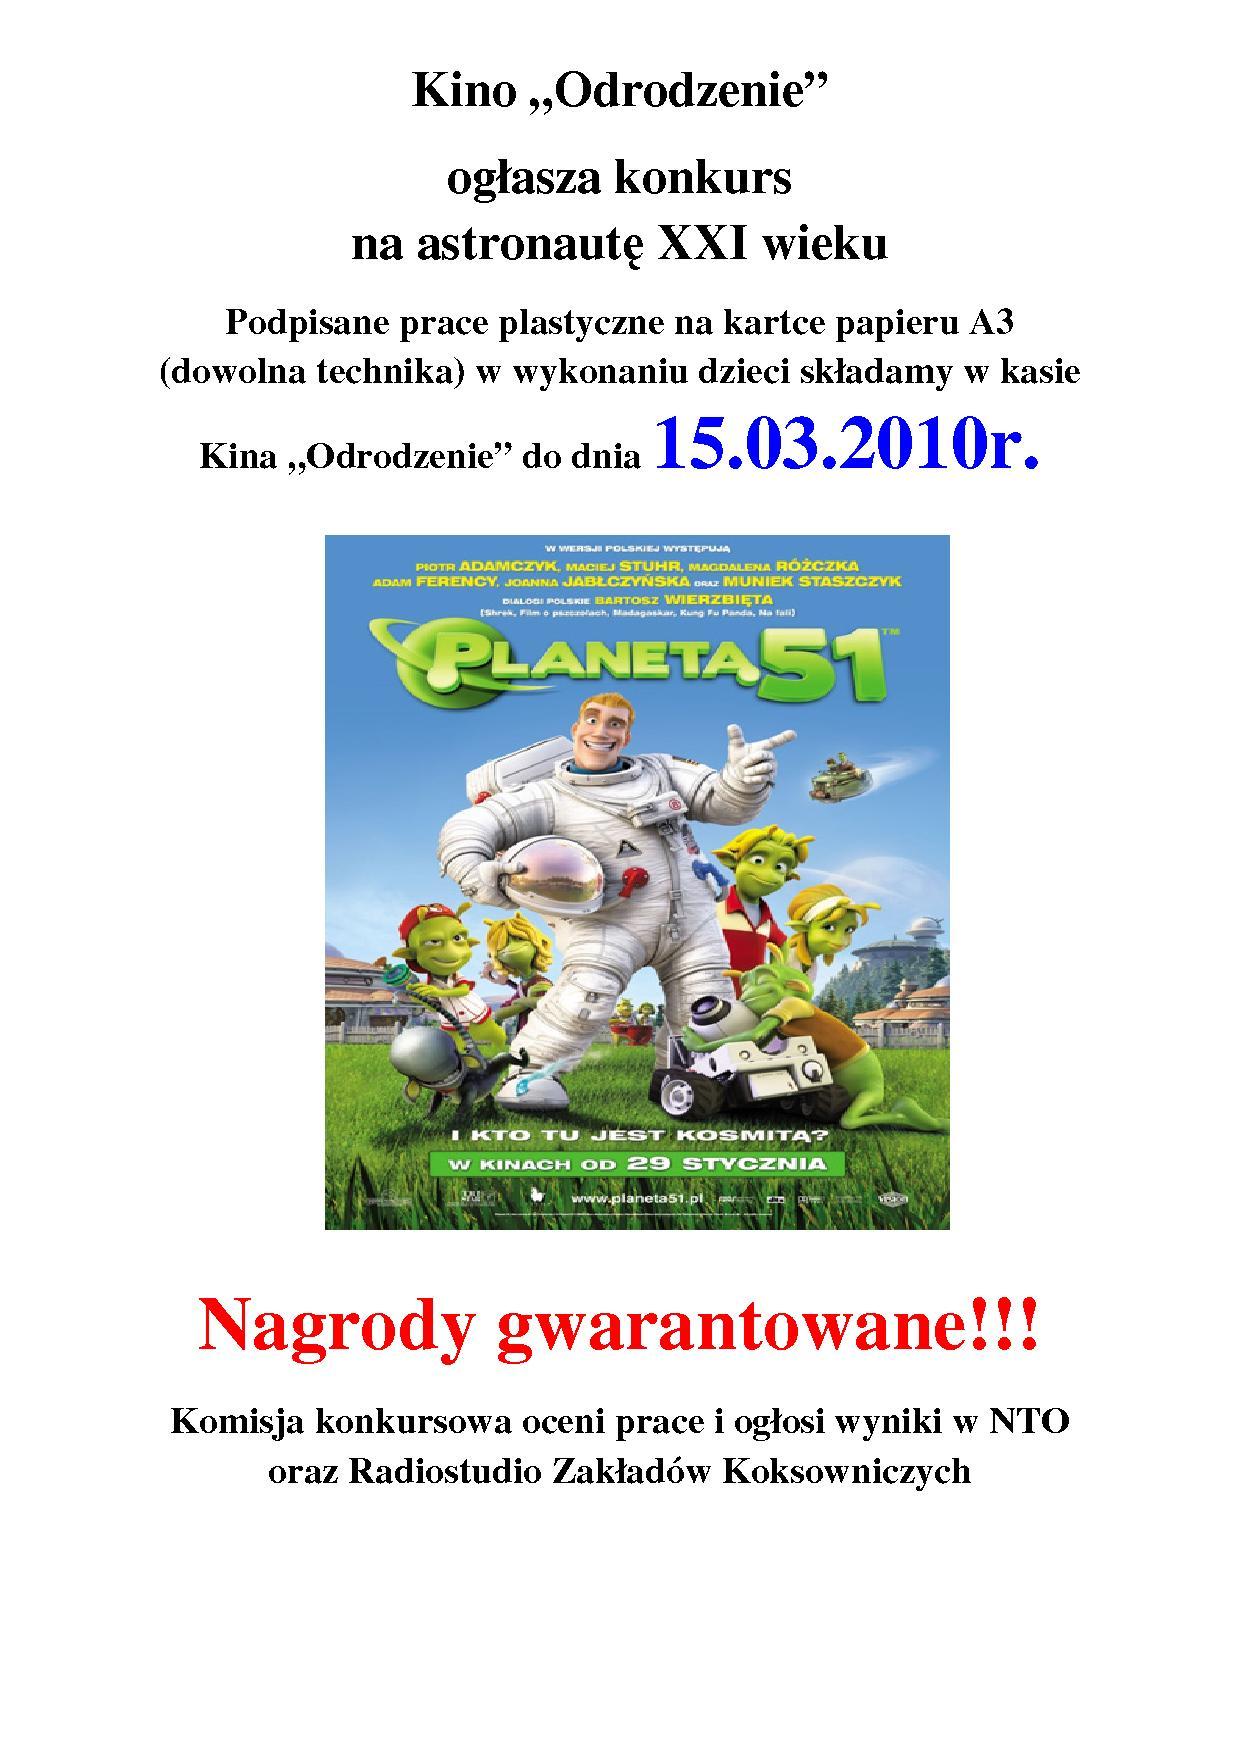 Plakat Planeta 51 konkurs.jpeg